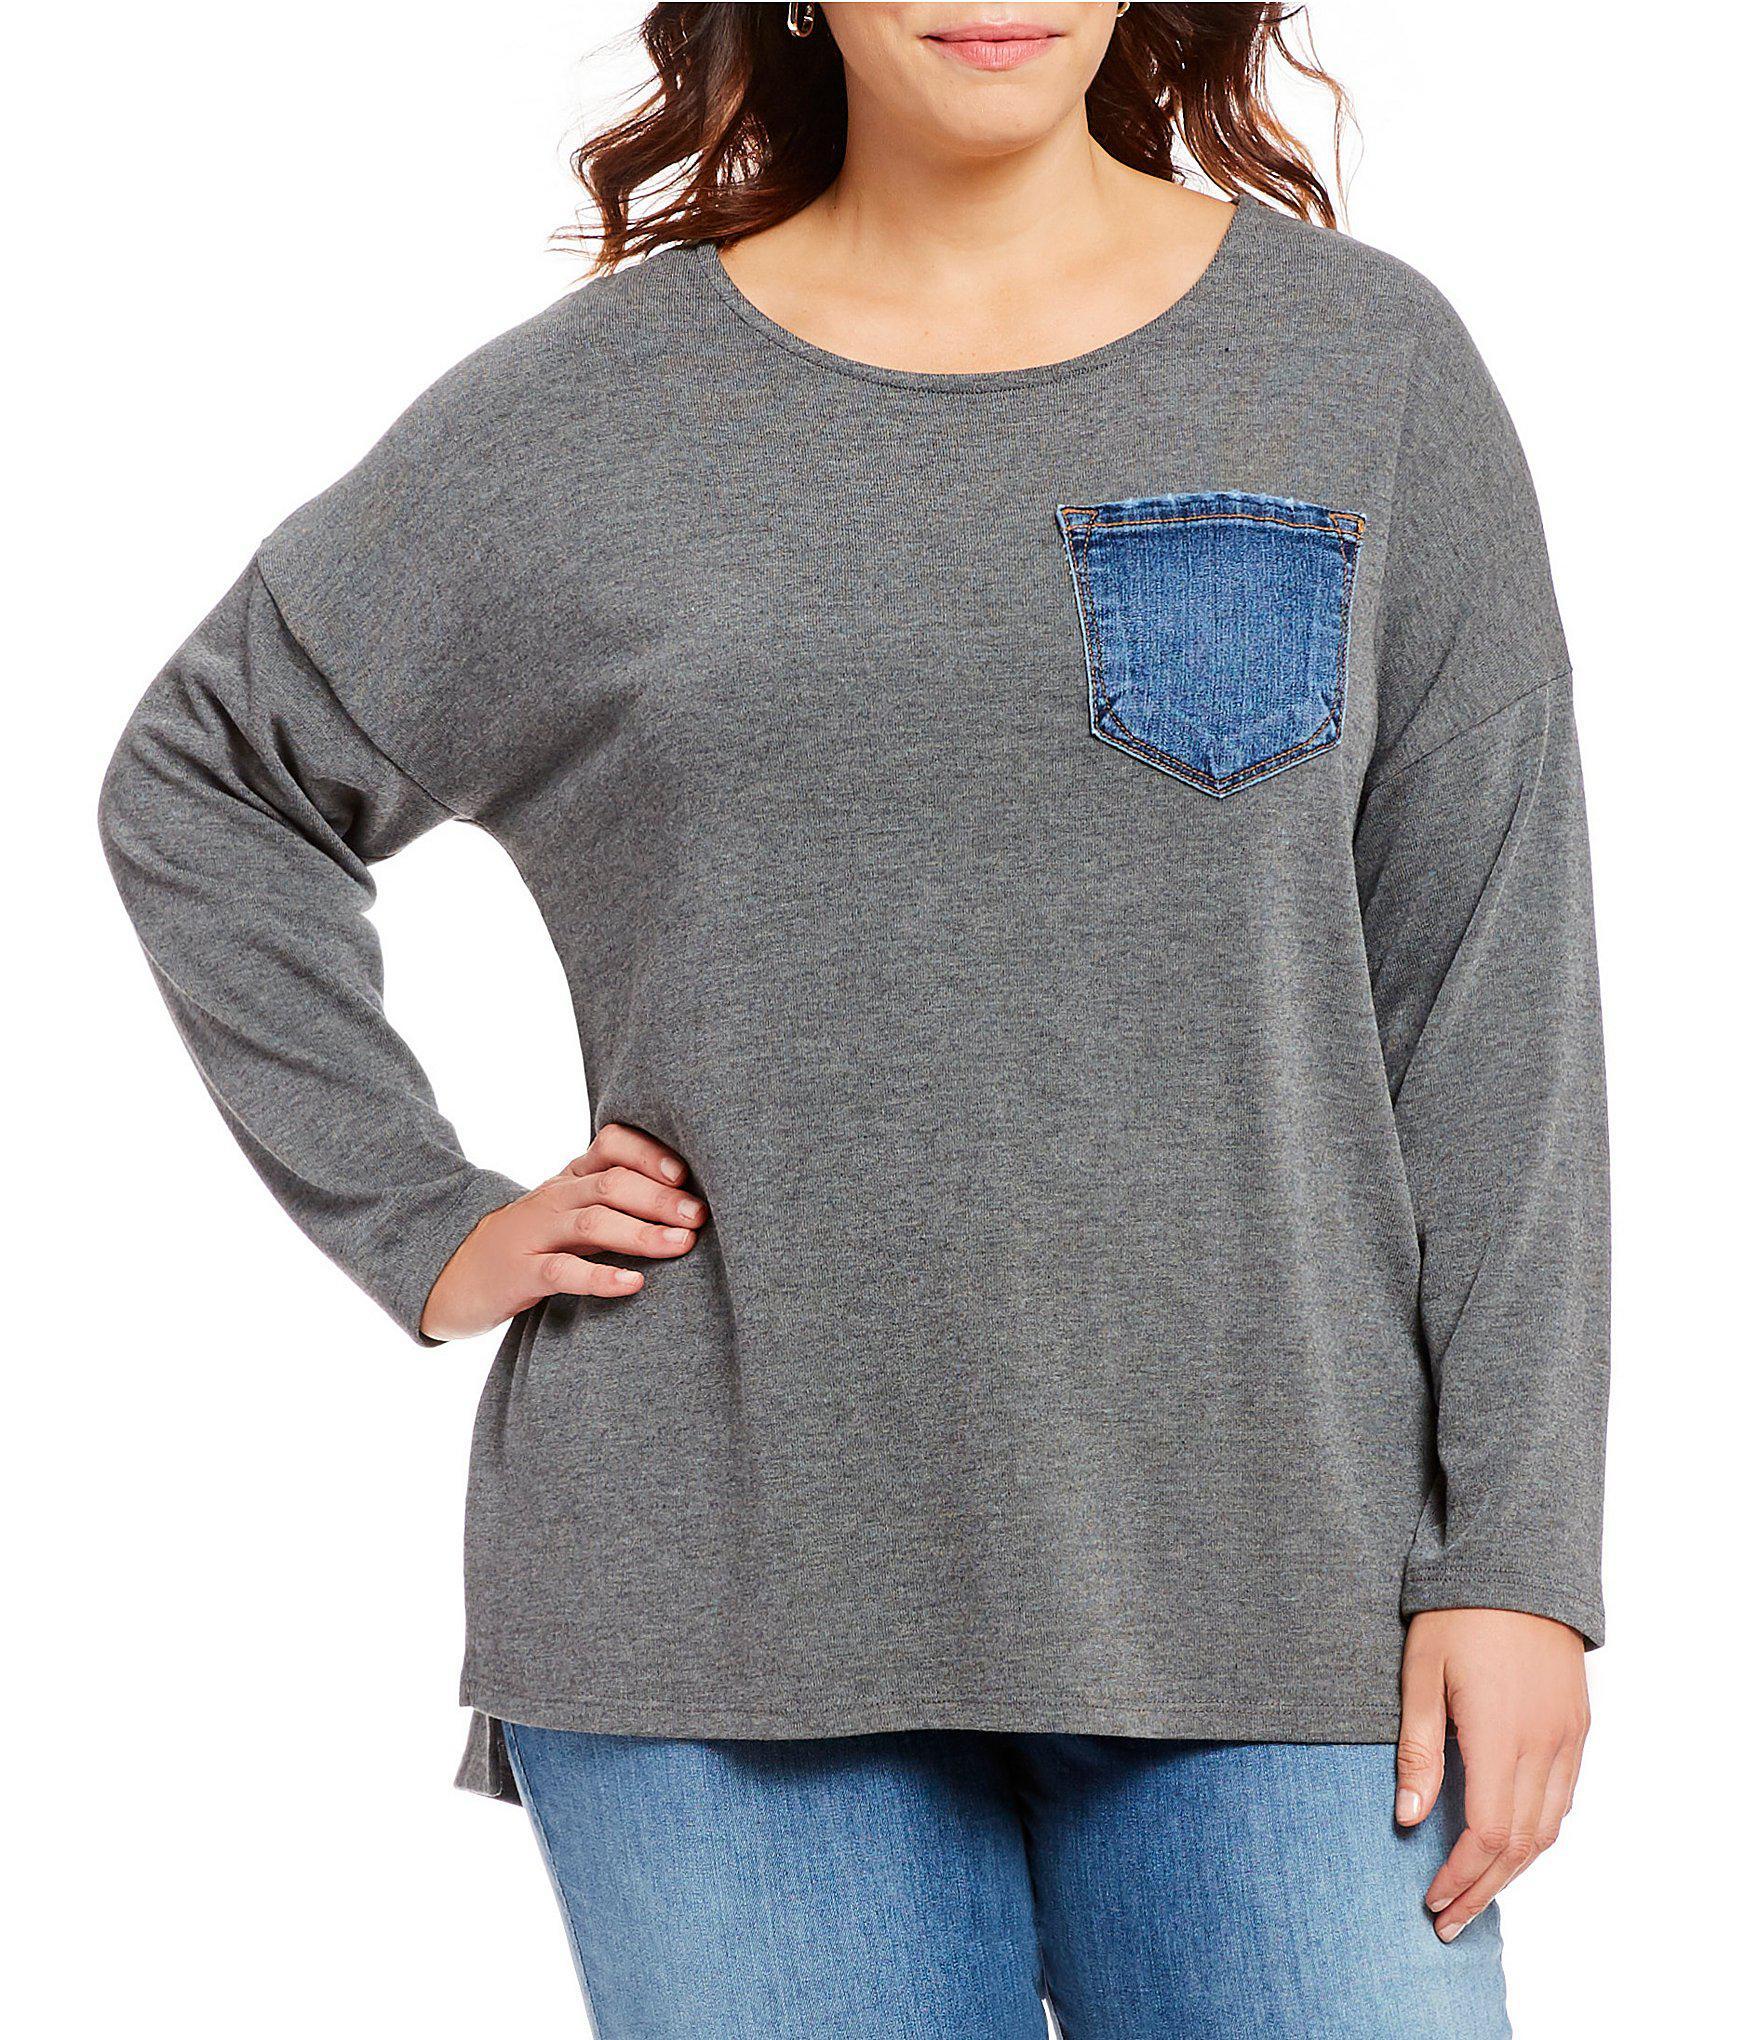 ddb9ba96413 Lyst - Karen Kane Plus Size Denim Pocket Knit Top in Gray